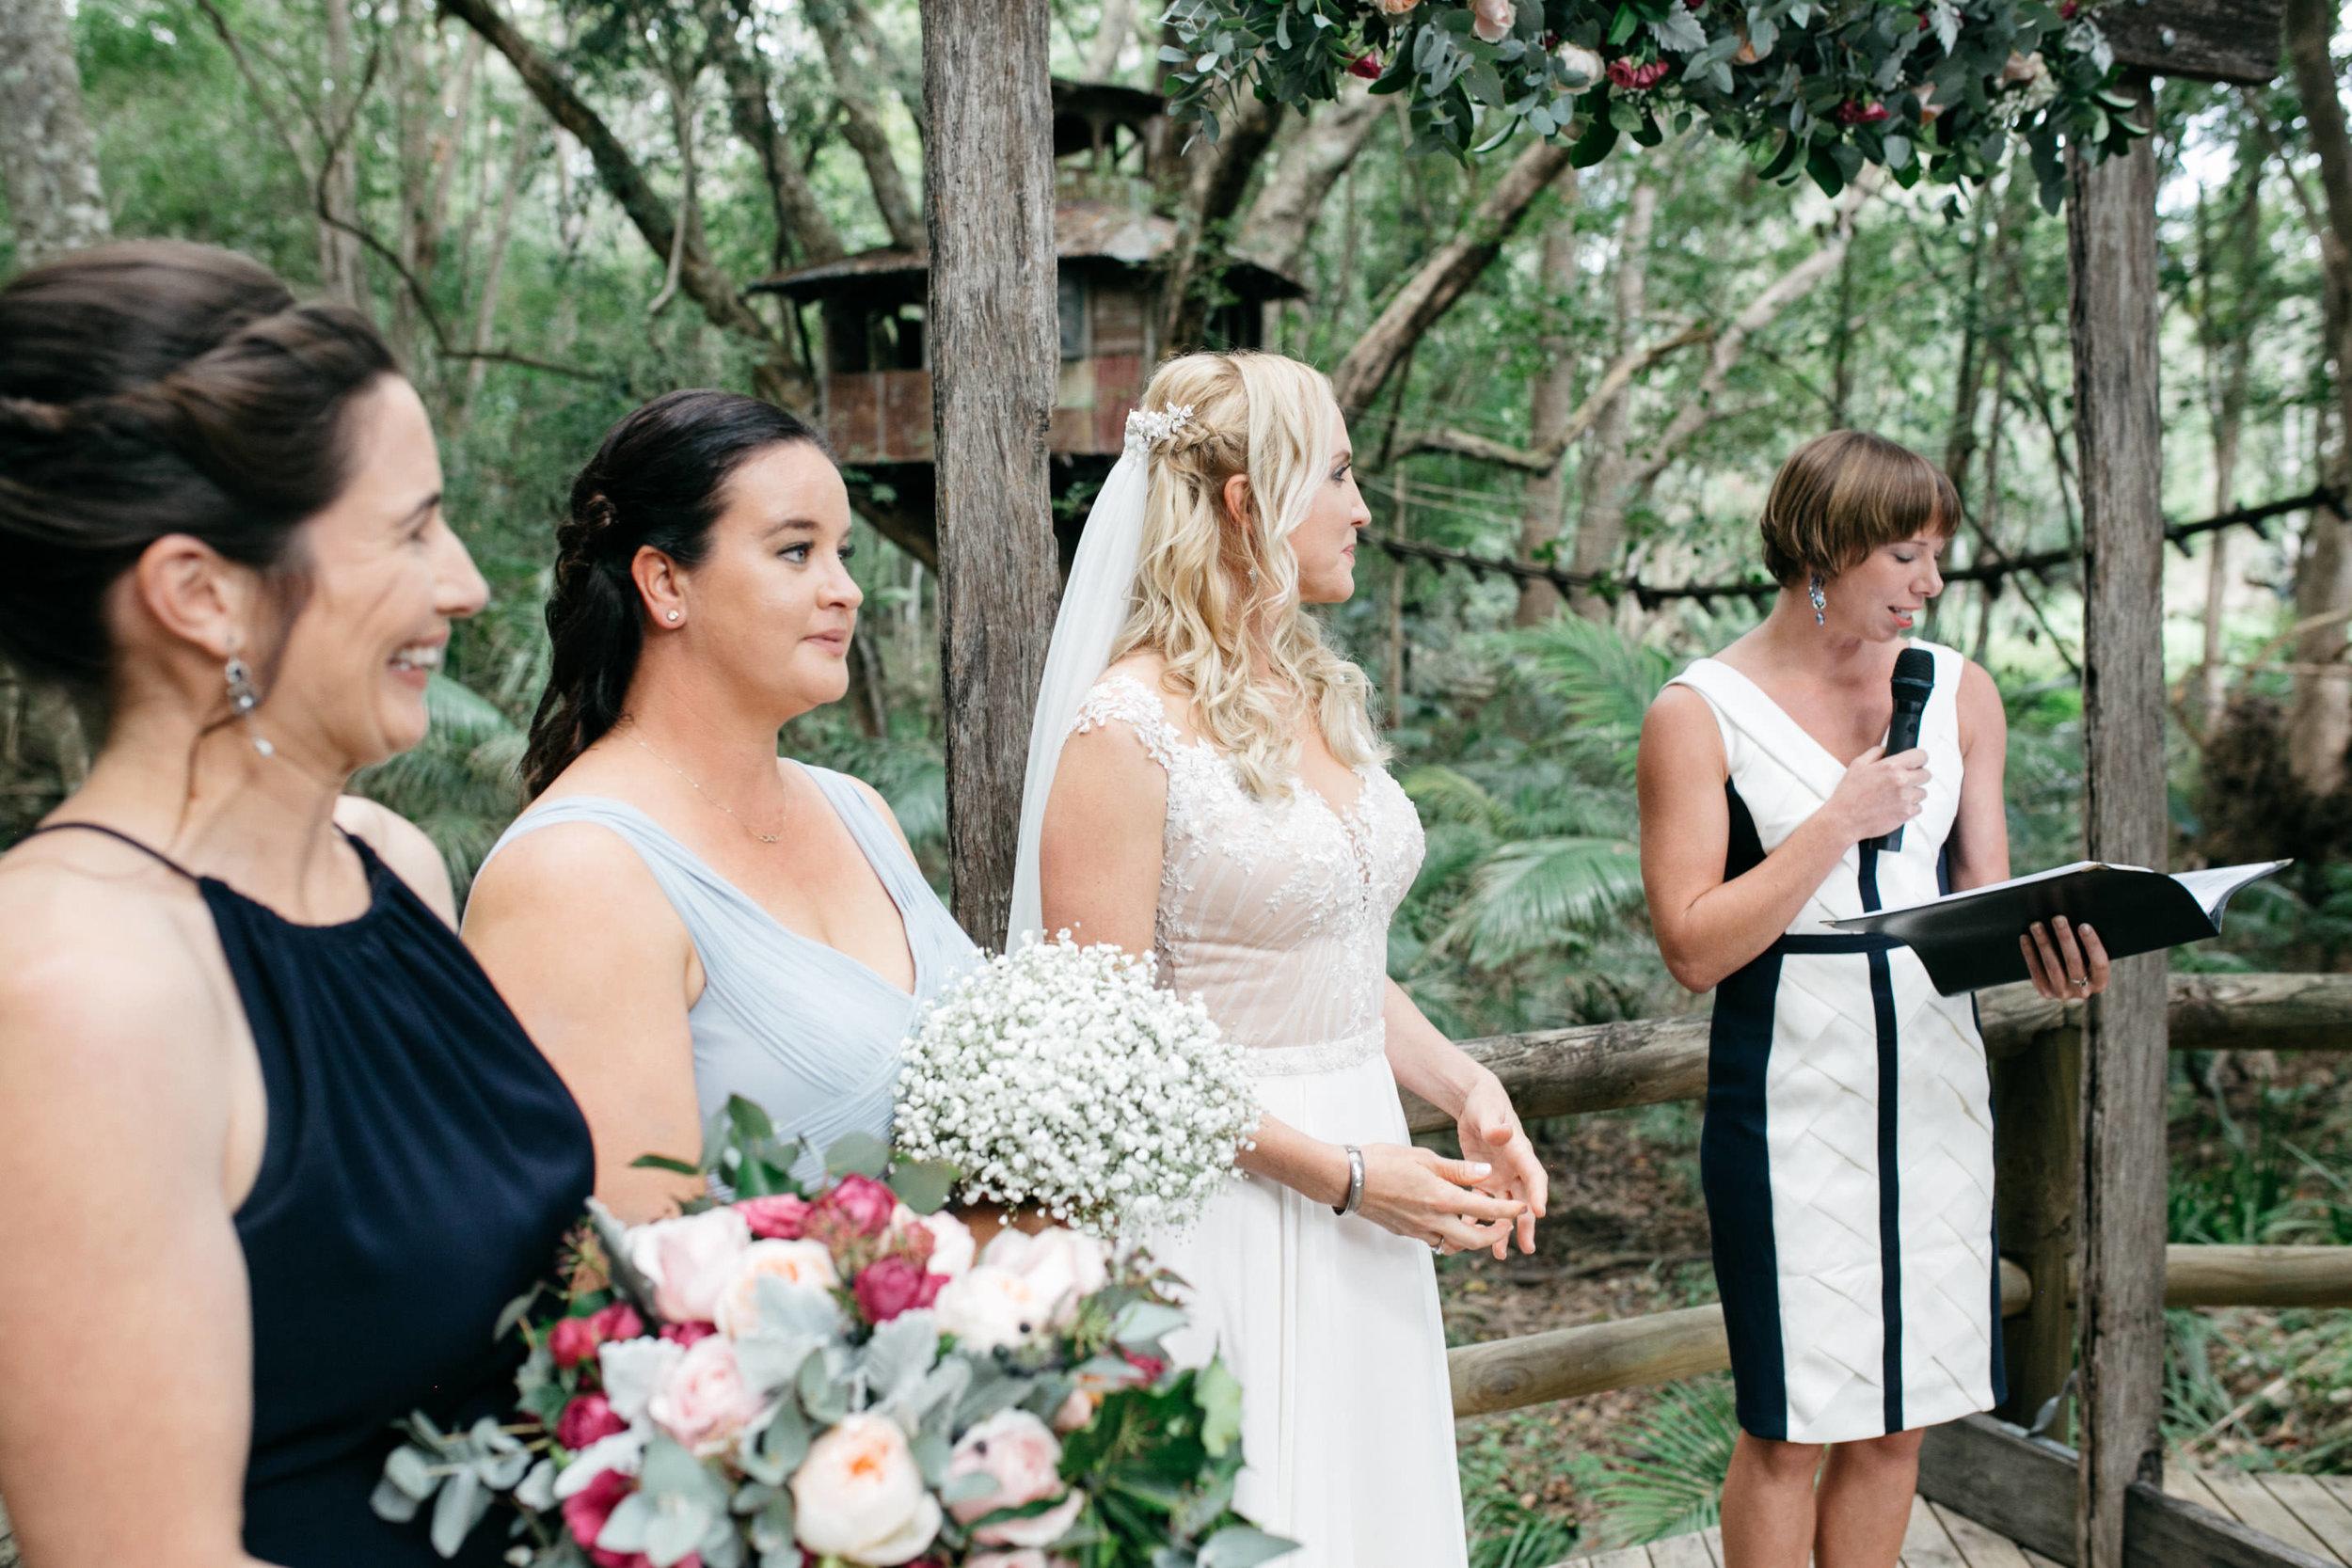 True North Photography_Boomerang Farm_Stacey and Isaac_Gold Coast Wedding_Barm Wedding_Hinterland Wedding-91.jpg